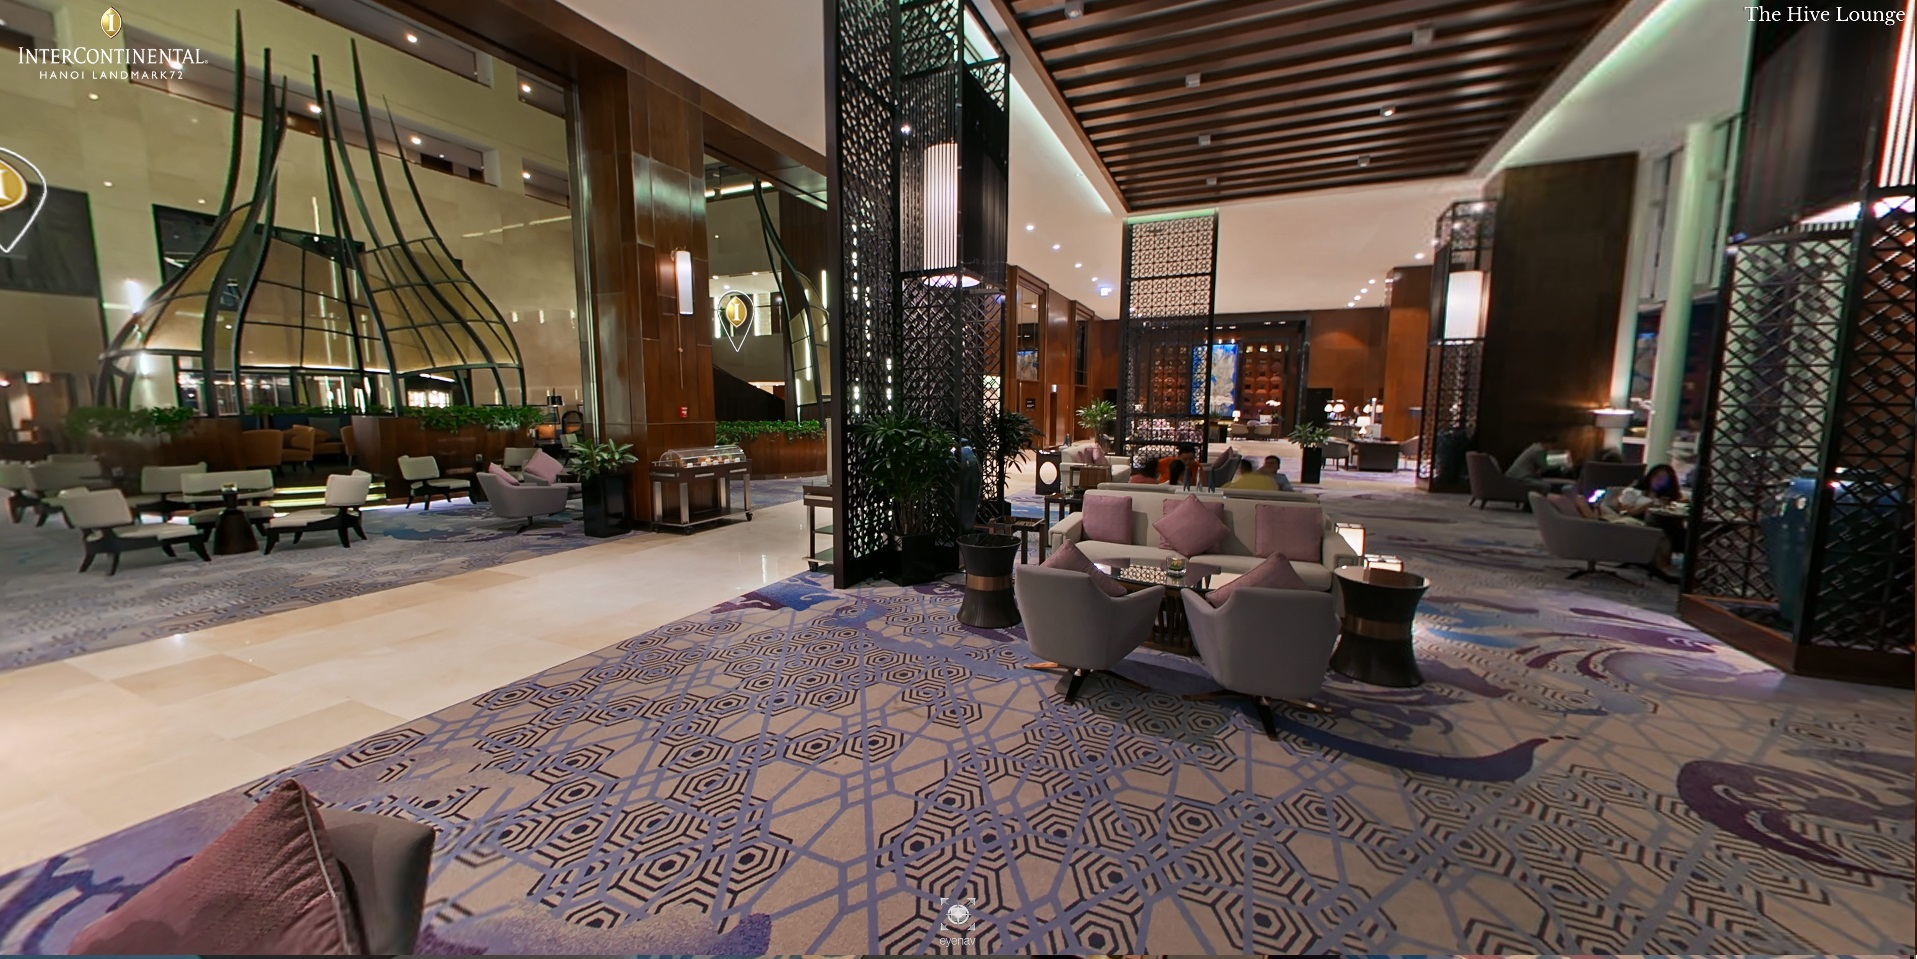 Hive Lounge in a Hanoi city centre hotel